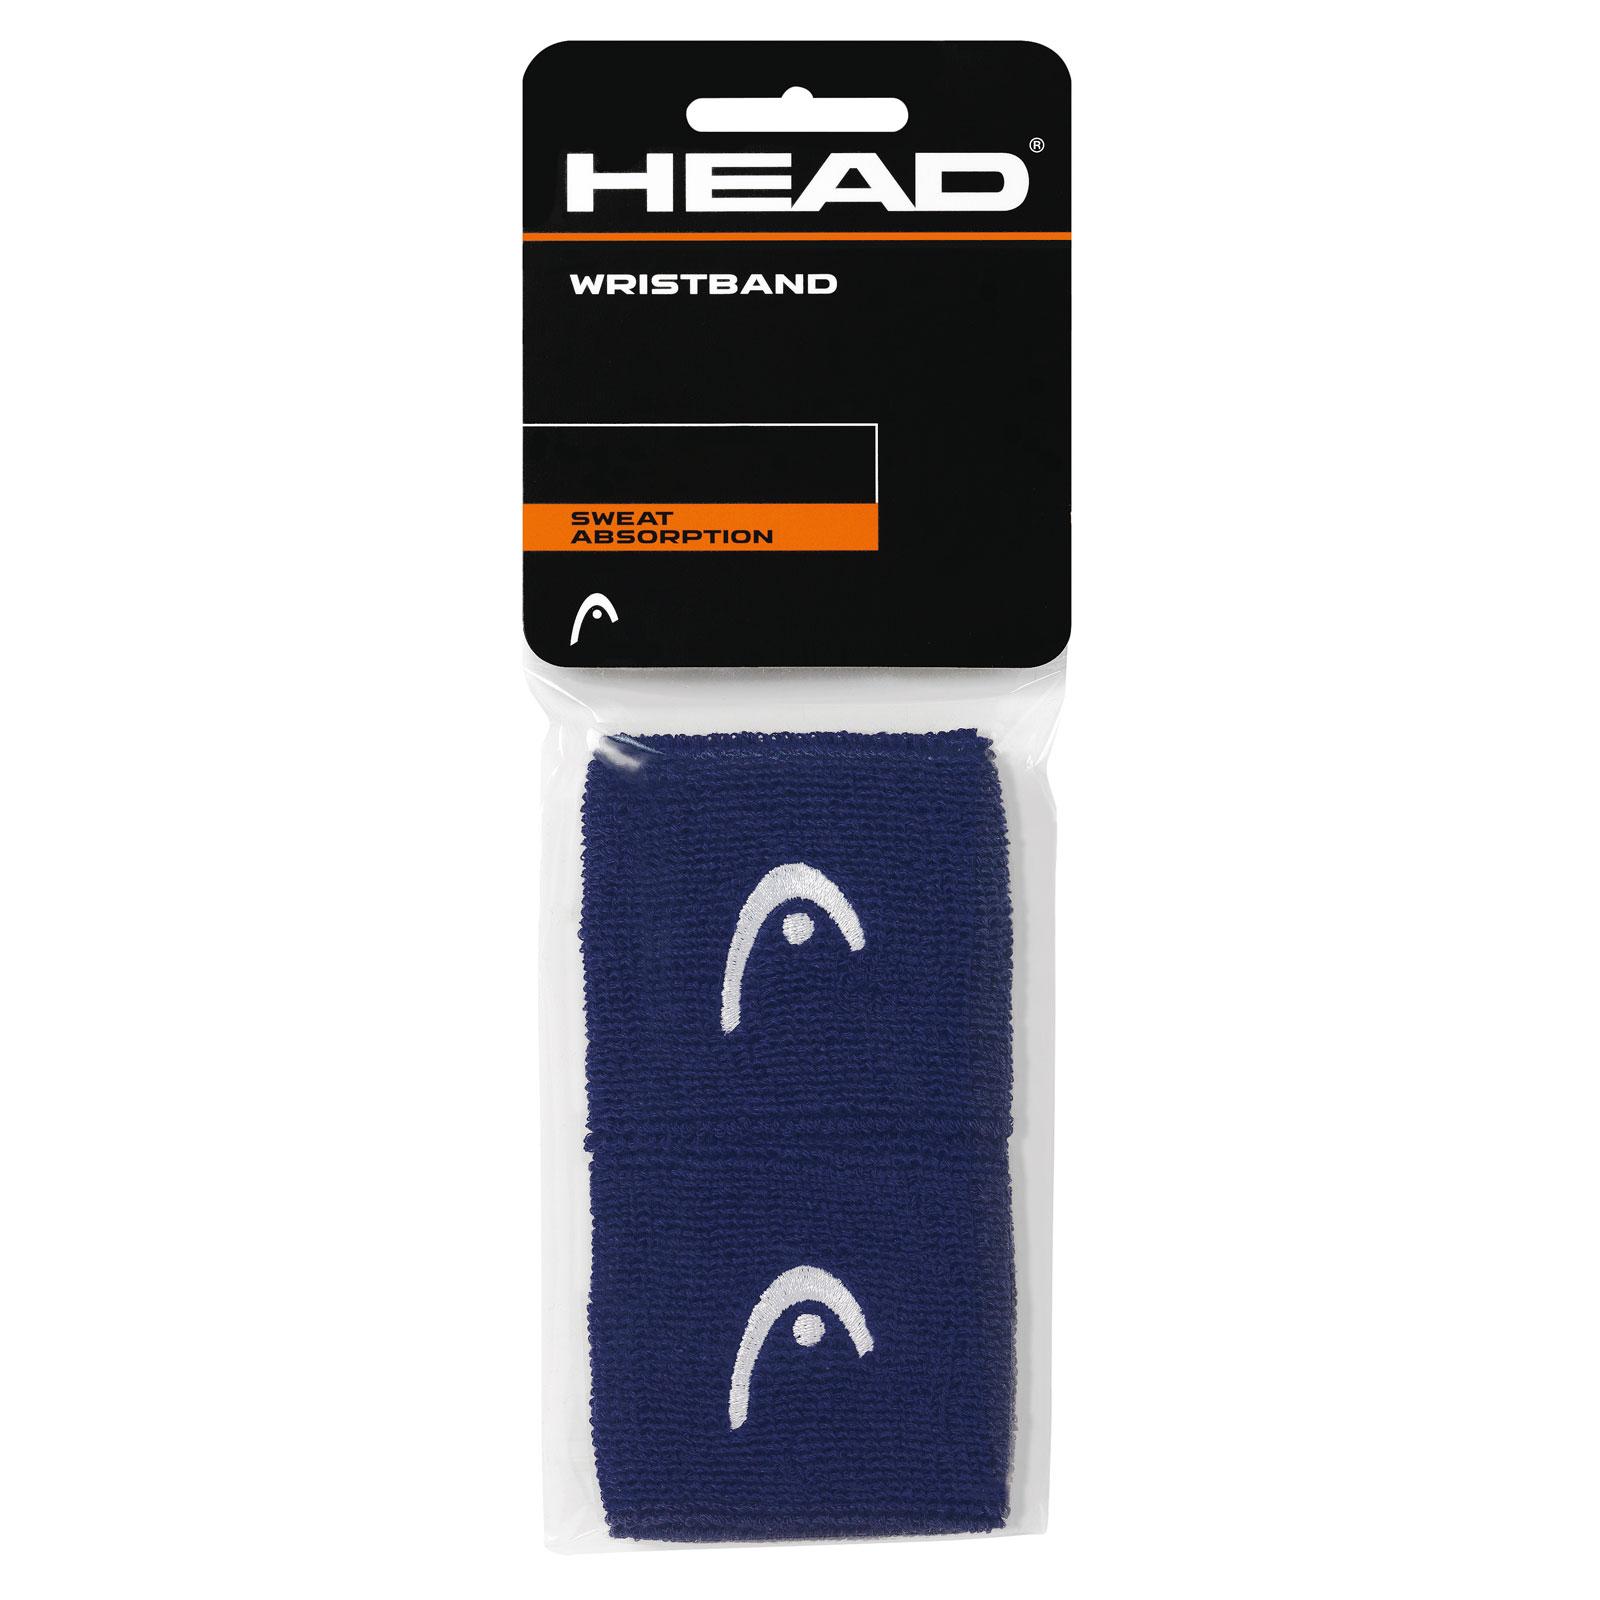 "HEAD Wristband 2,5"" 2016 navy"